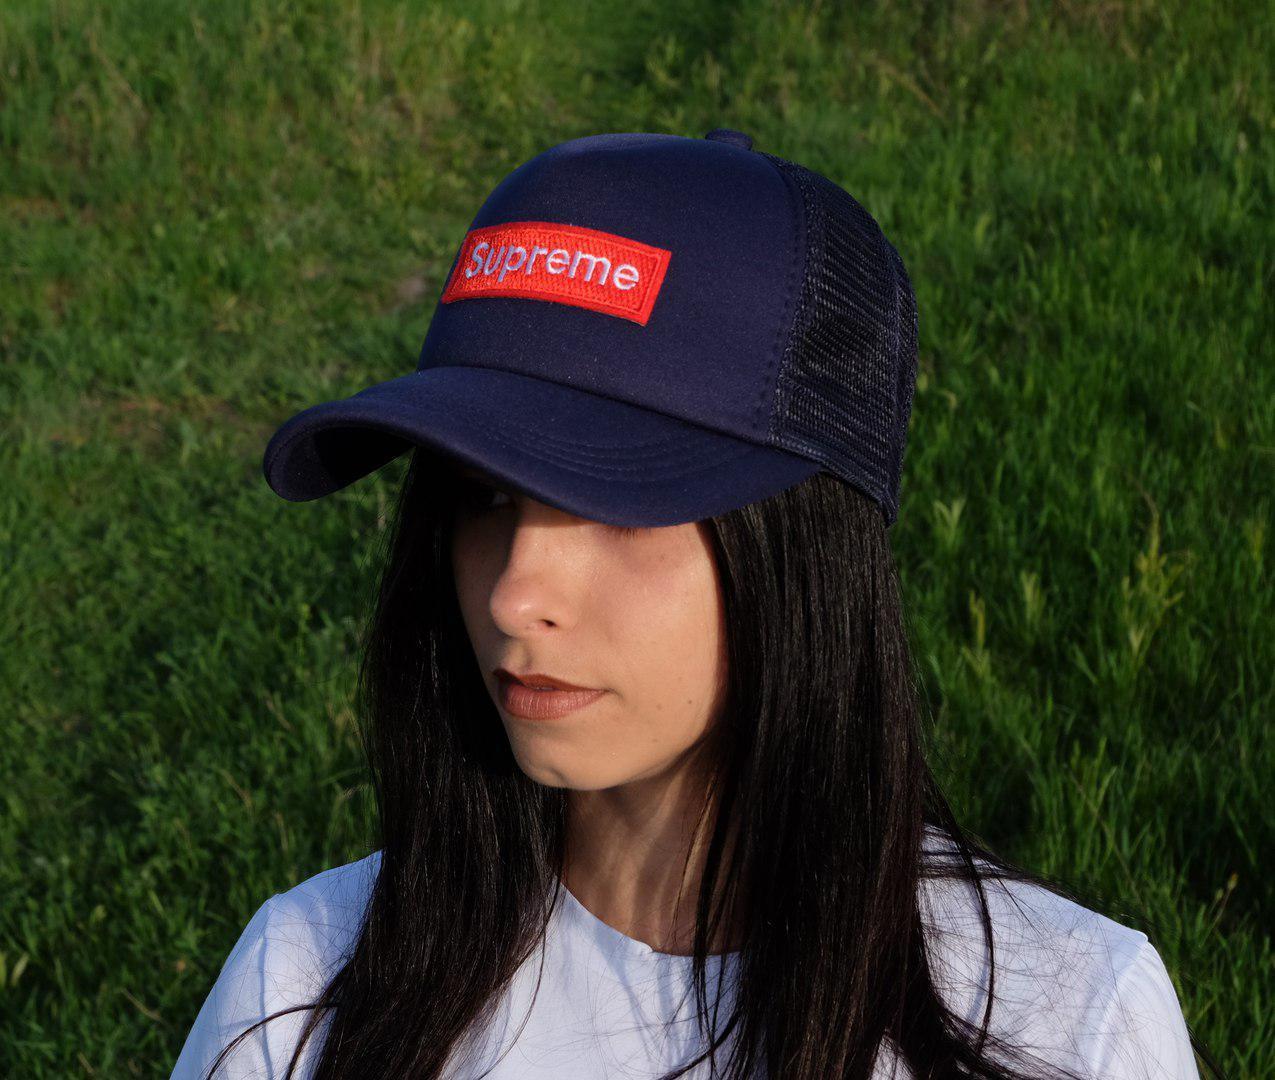 Женская кепка с логотипом сзади сетка